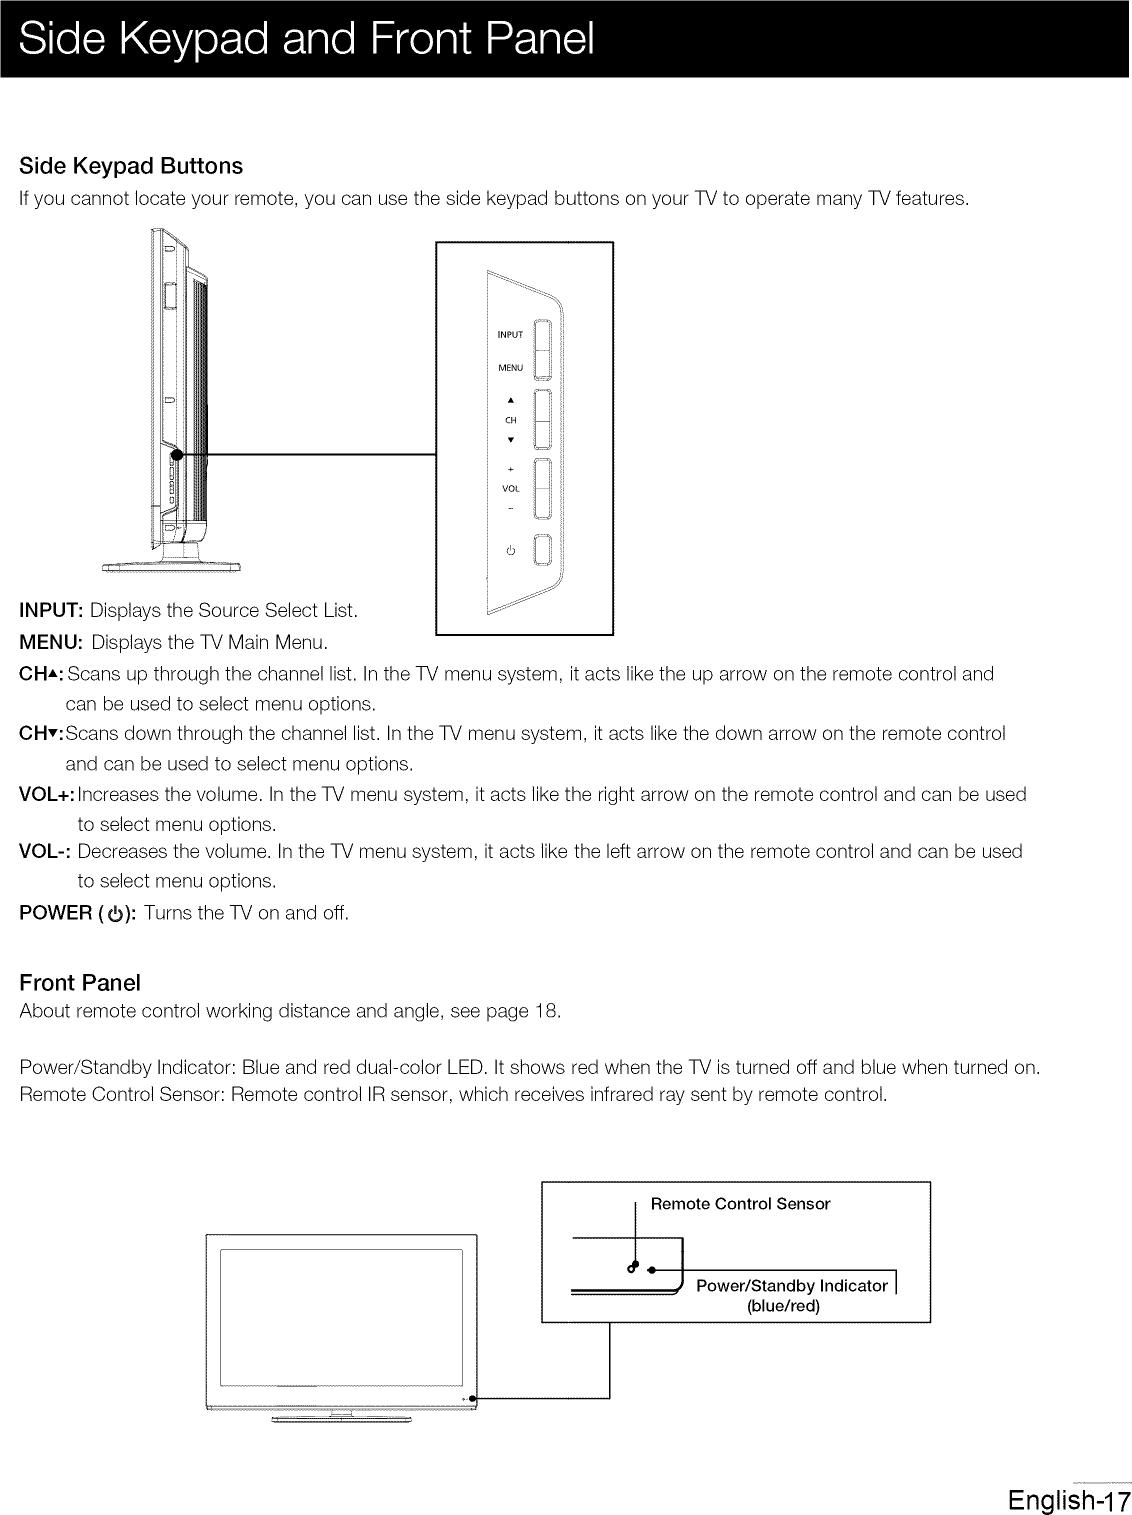 siga cc1s wiring diagram Collection-siga cc1s wiring diagram Download Siga Ct1 Wiring Diagram Inspirational Rca 42pa30rq L User Manual DOWNLOAD Wiring Diagram Pics Detail Name siga cc1s 11-r